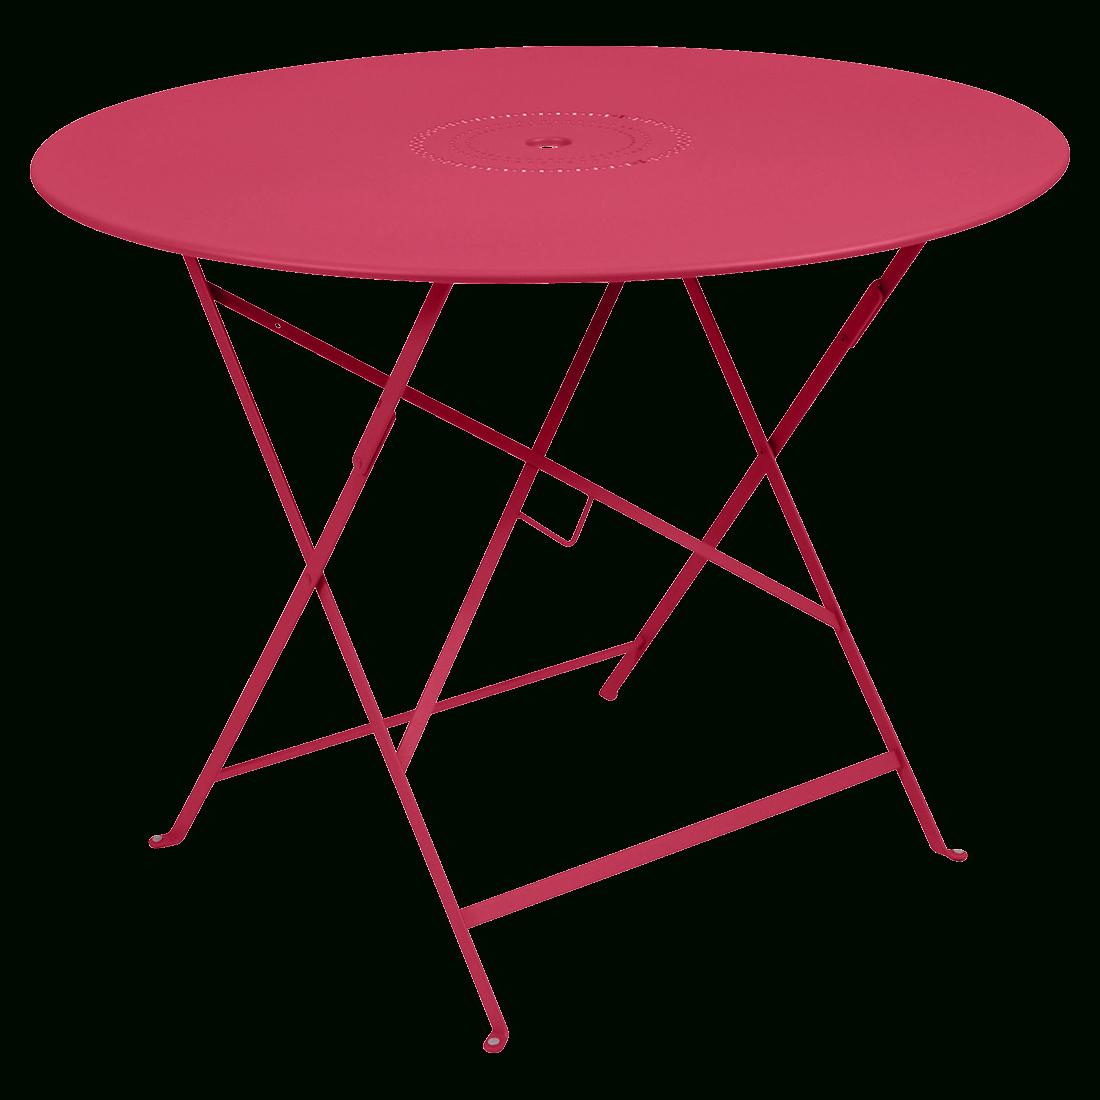 Ø 96 Cm Floréal Table, Outdoor Foldable Table dedans Table Jardin Rose